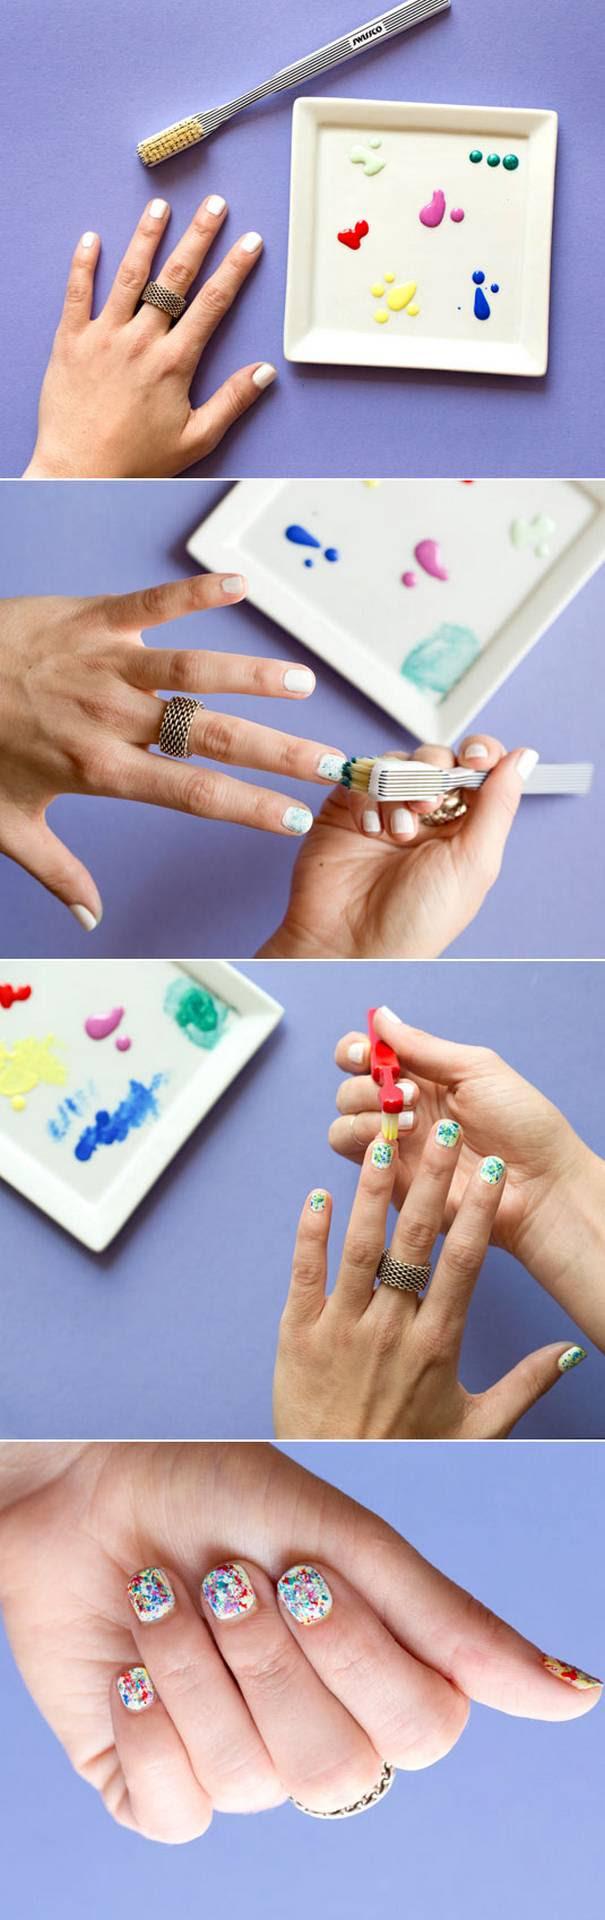 tn_uso-escova-dente-13